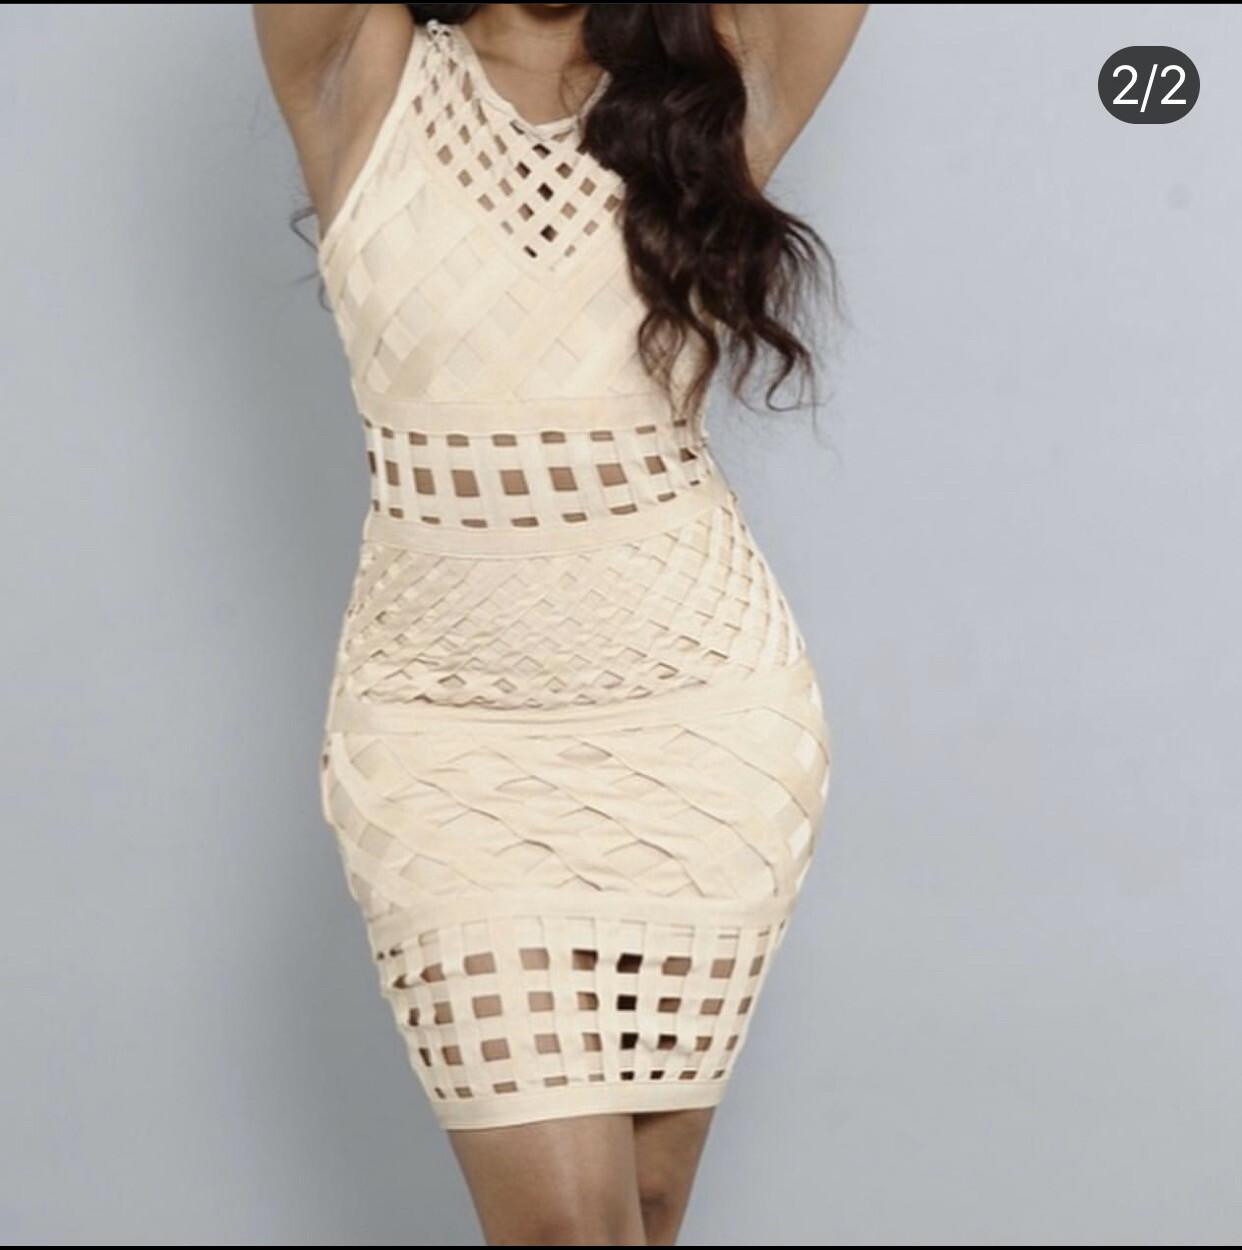 So Tied Up Dress